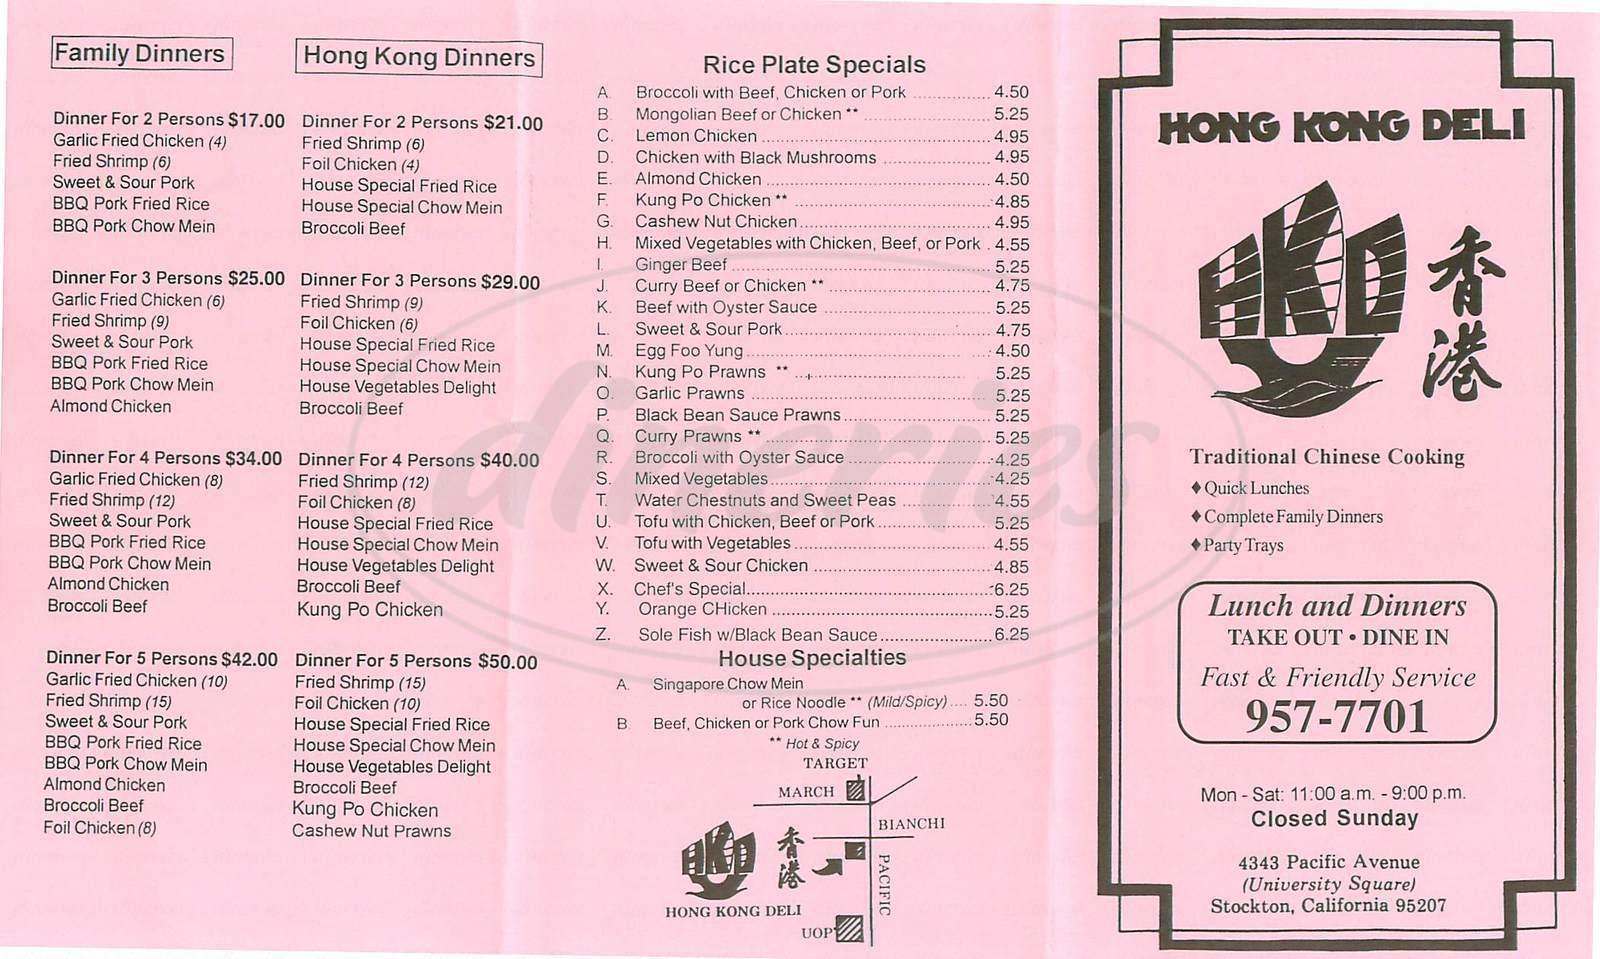 menu for Hong Kong Deli